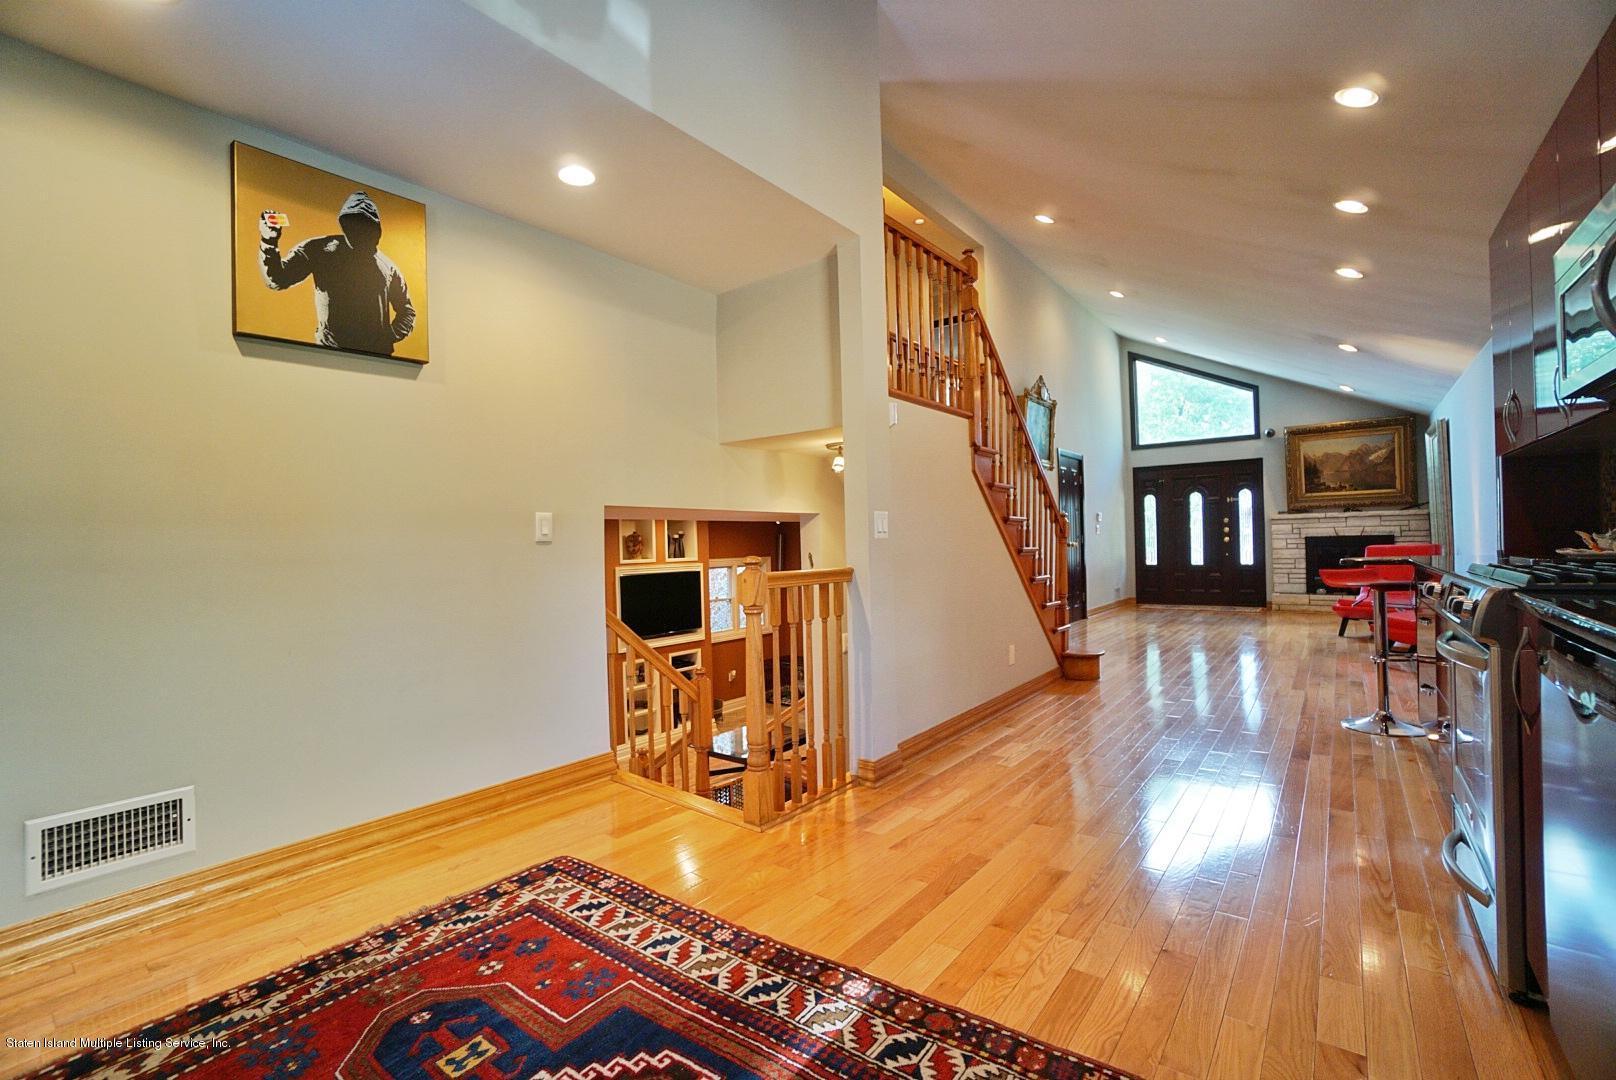 Single Family - Detached 48 Ocean Terrace  Staten Island, NY 10314, MLS-1130826-22